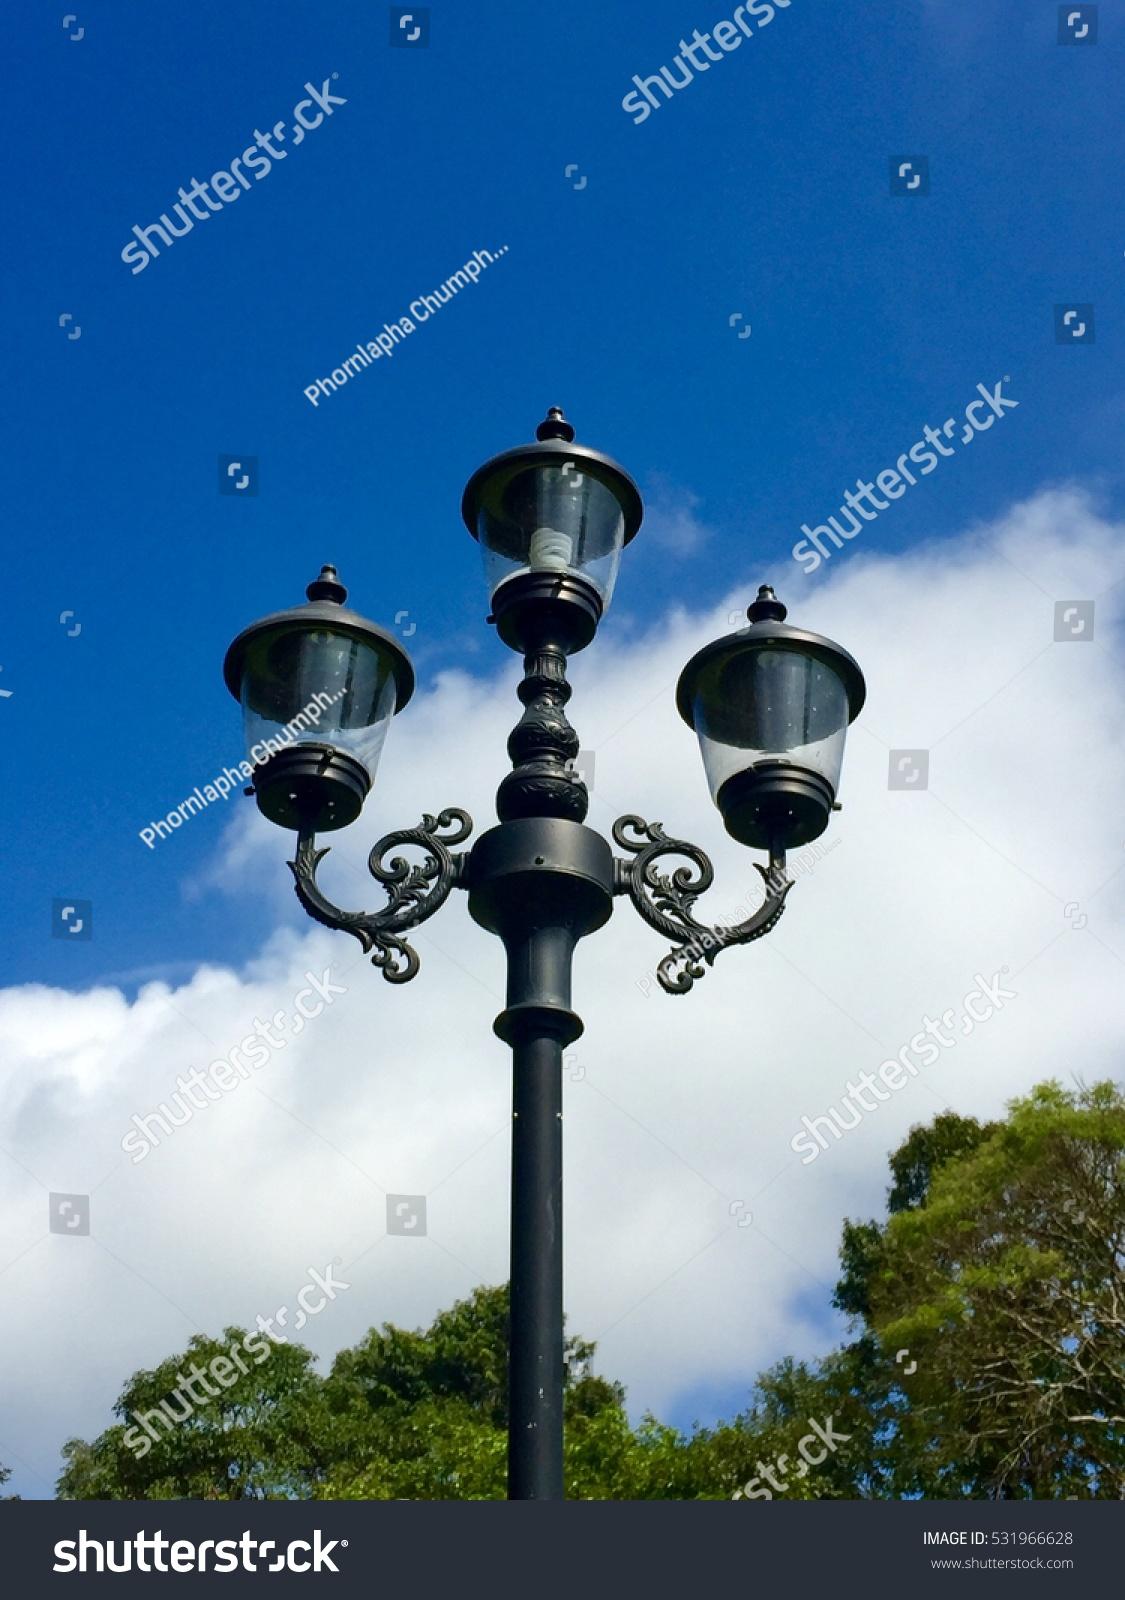 Blake Grounded Center Field Light Poles Stock Photo (Edit Now